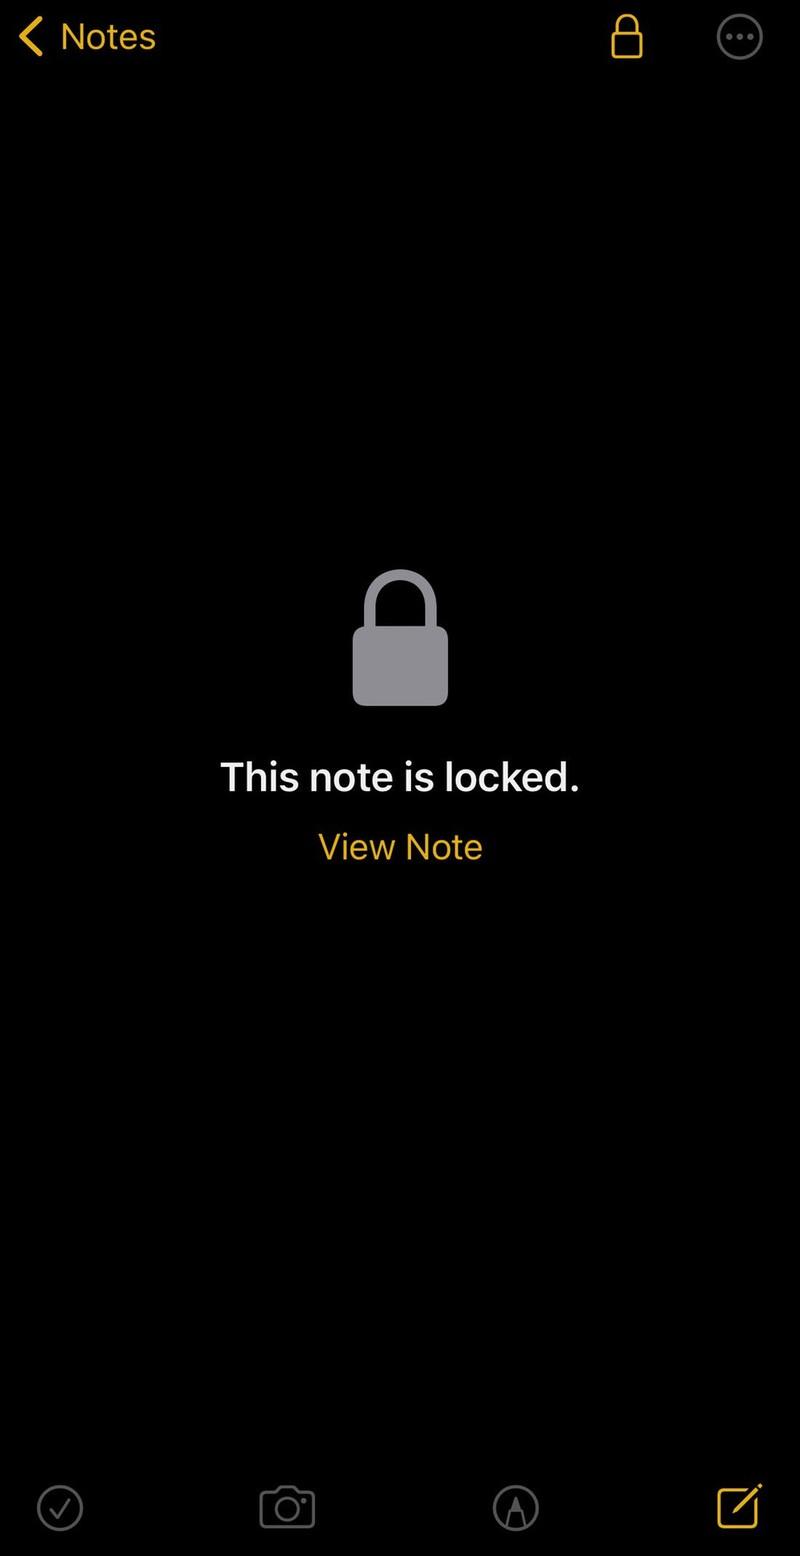 Nhung cach don gian de an va khoa anh/video rieng tu tren iPhone-Hinh-9